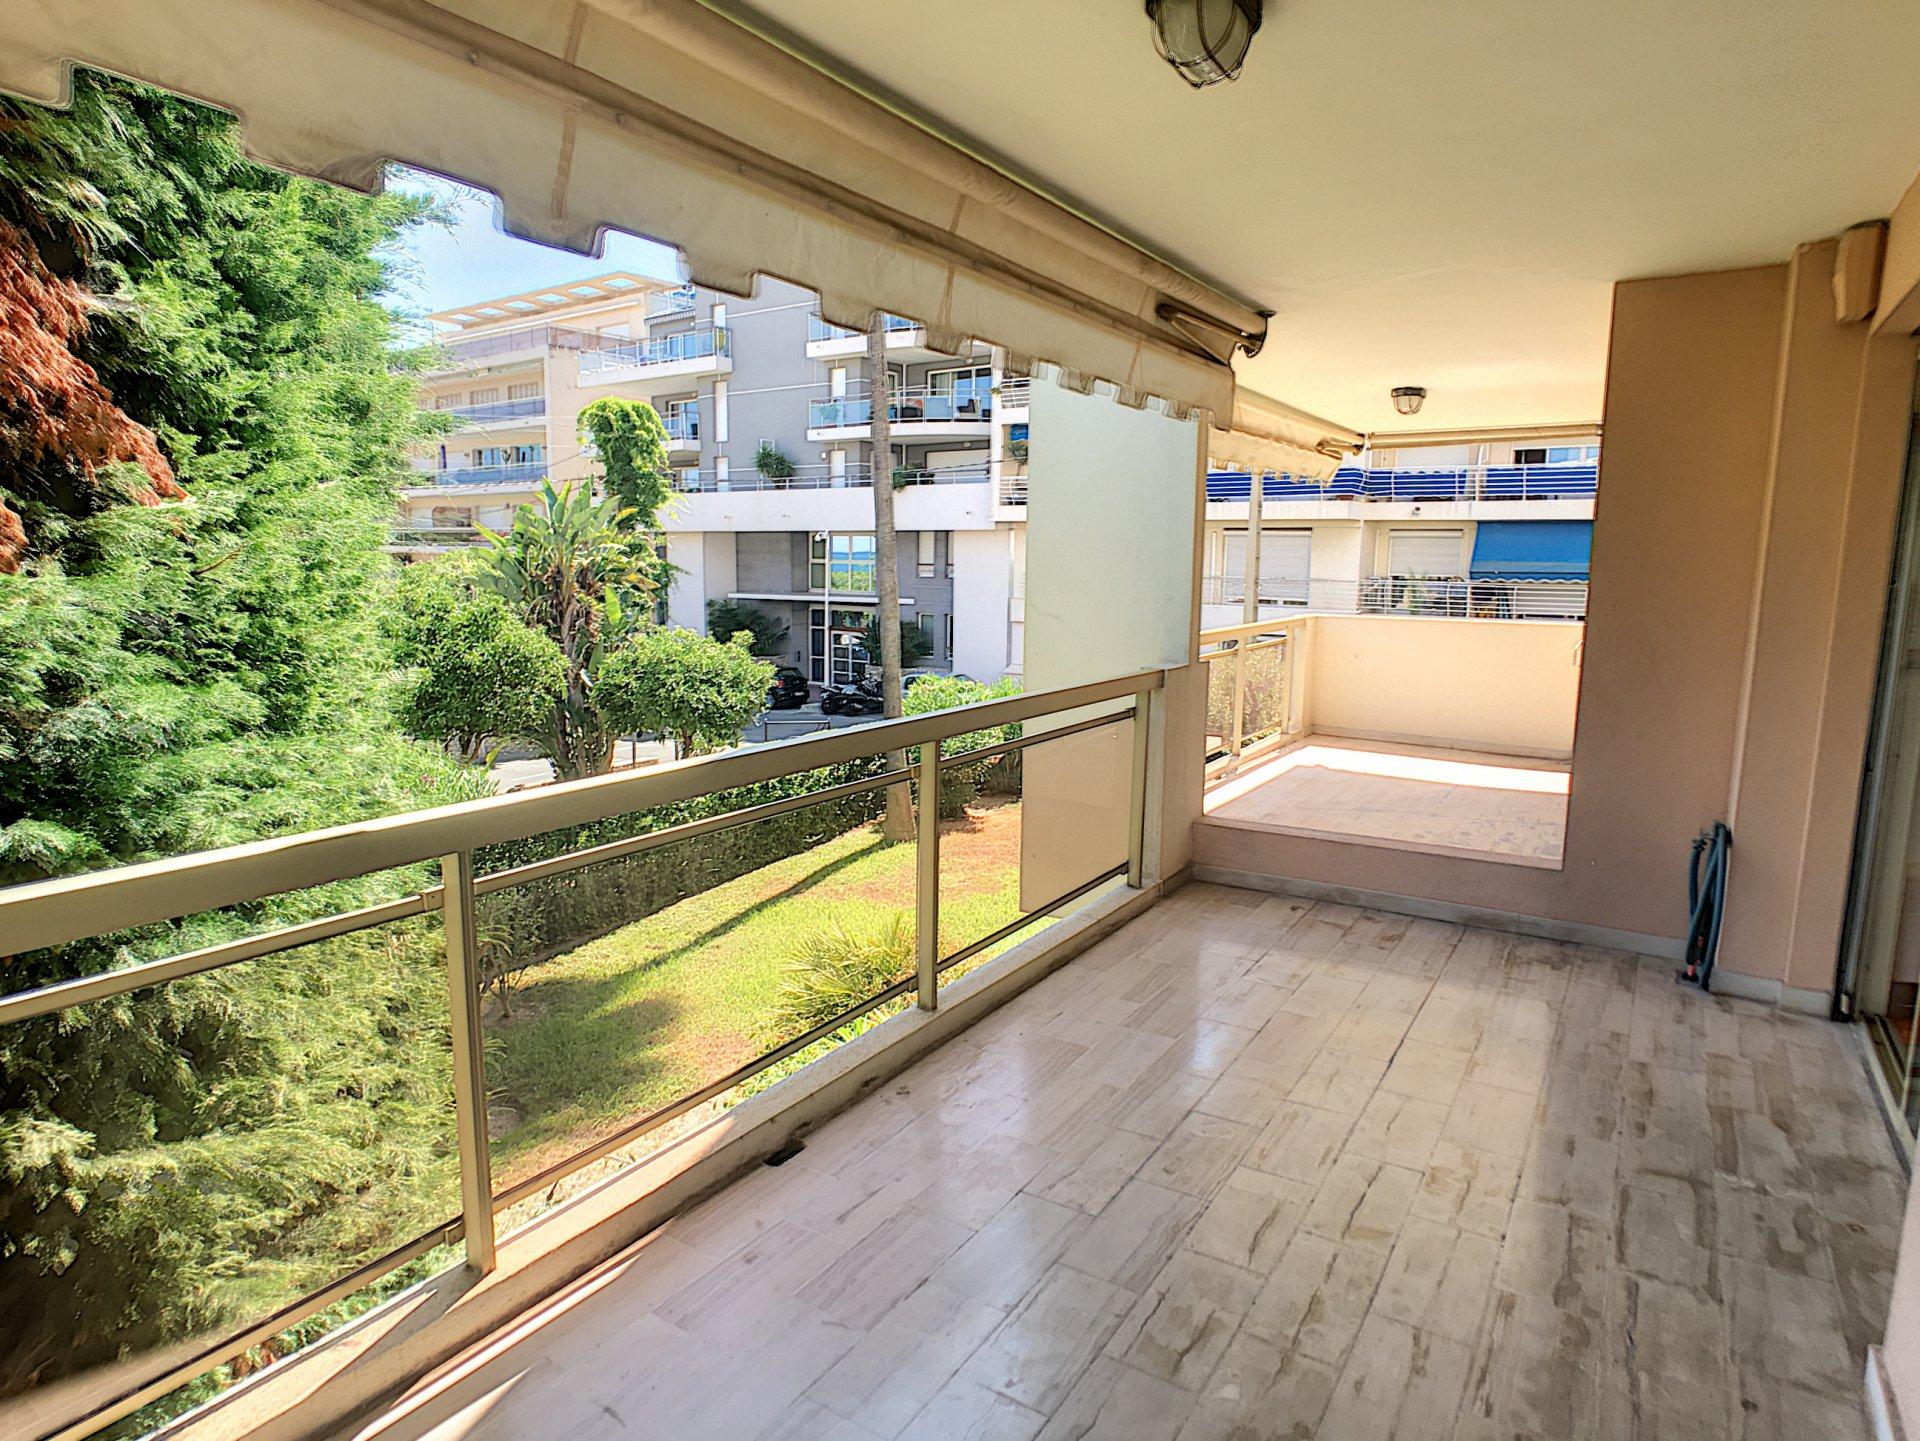 Exclusivité-Palm Beach-2 P 61 m² avec profonde terrasse